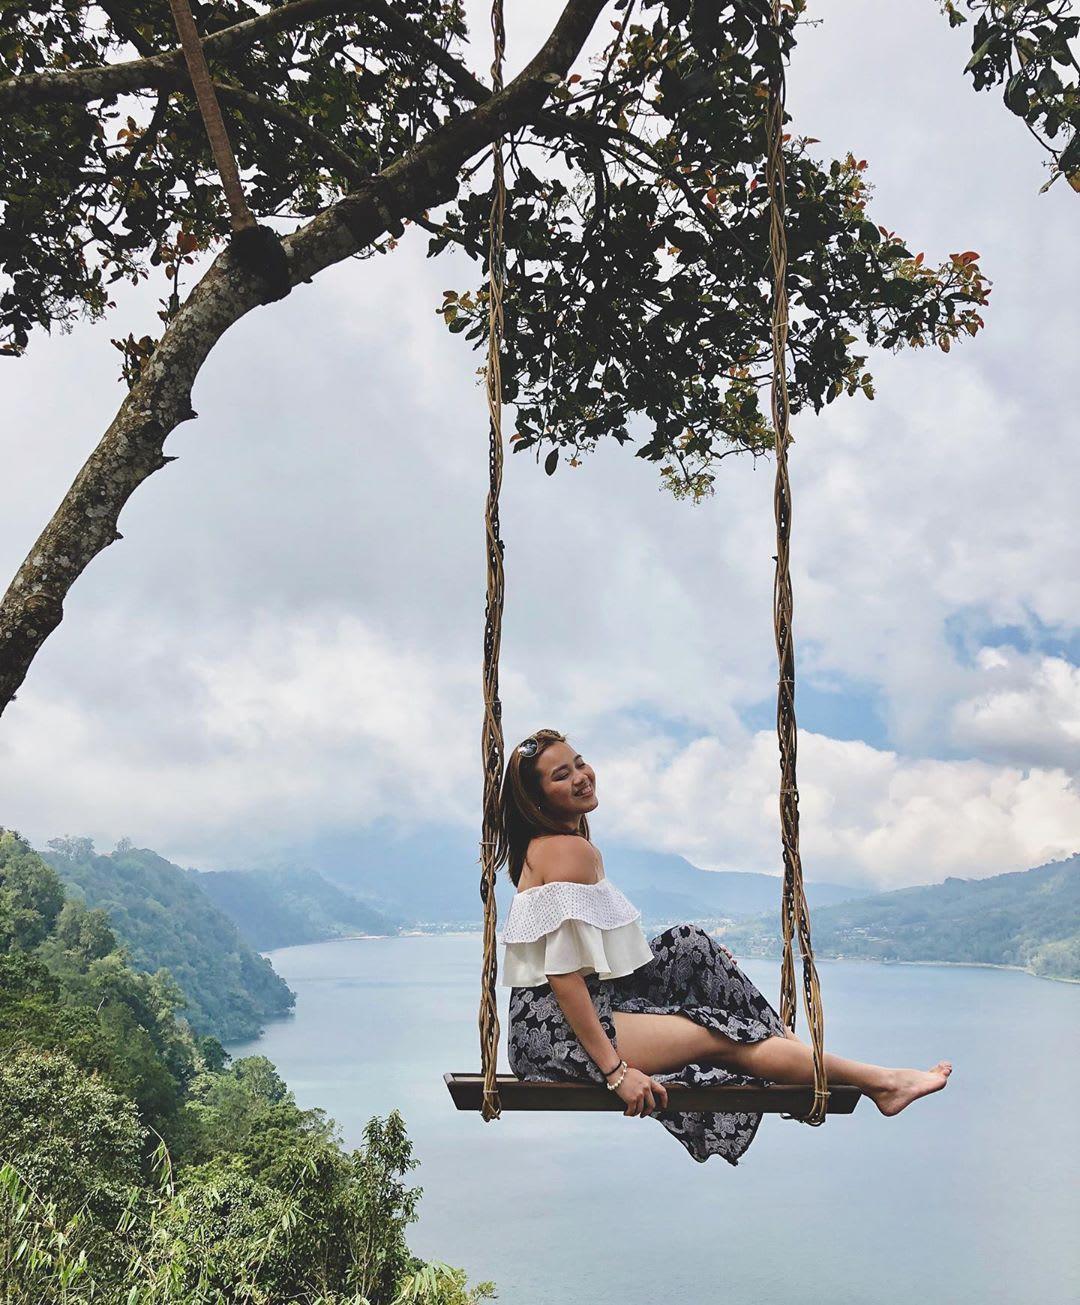 Wanagiri Hidden Hills swing